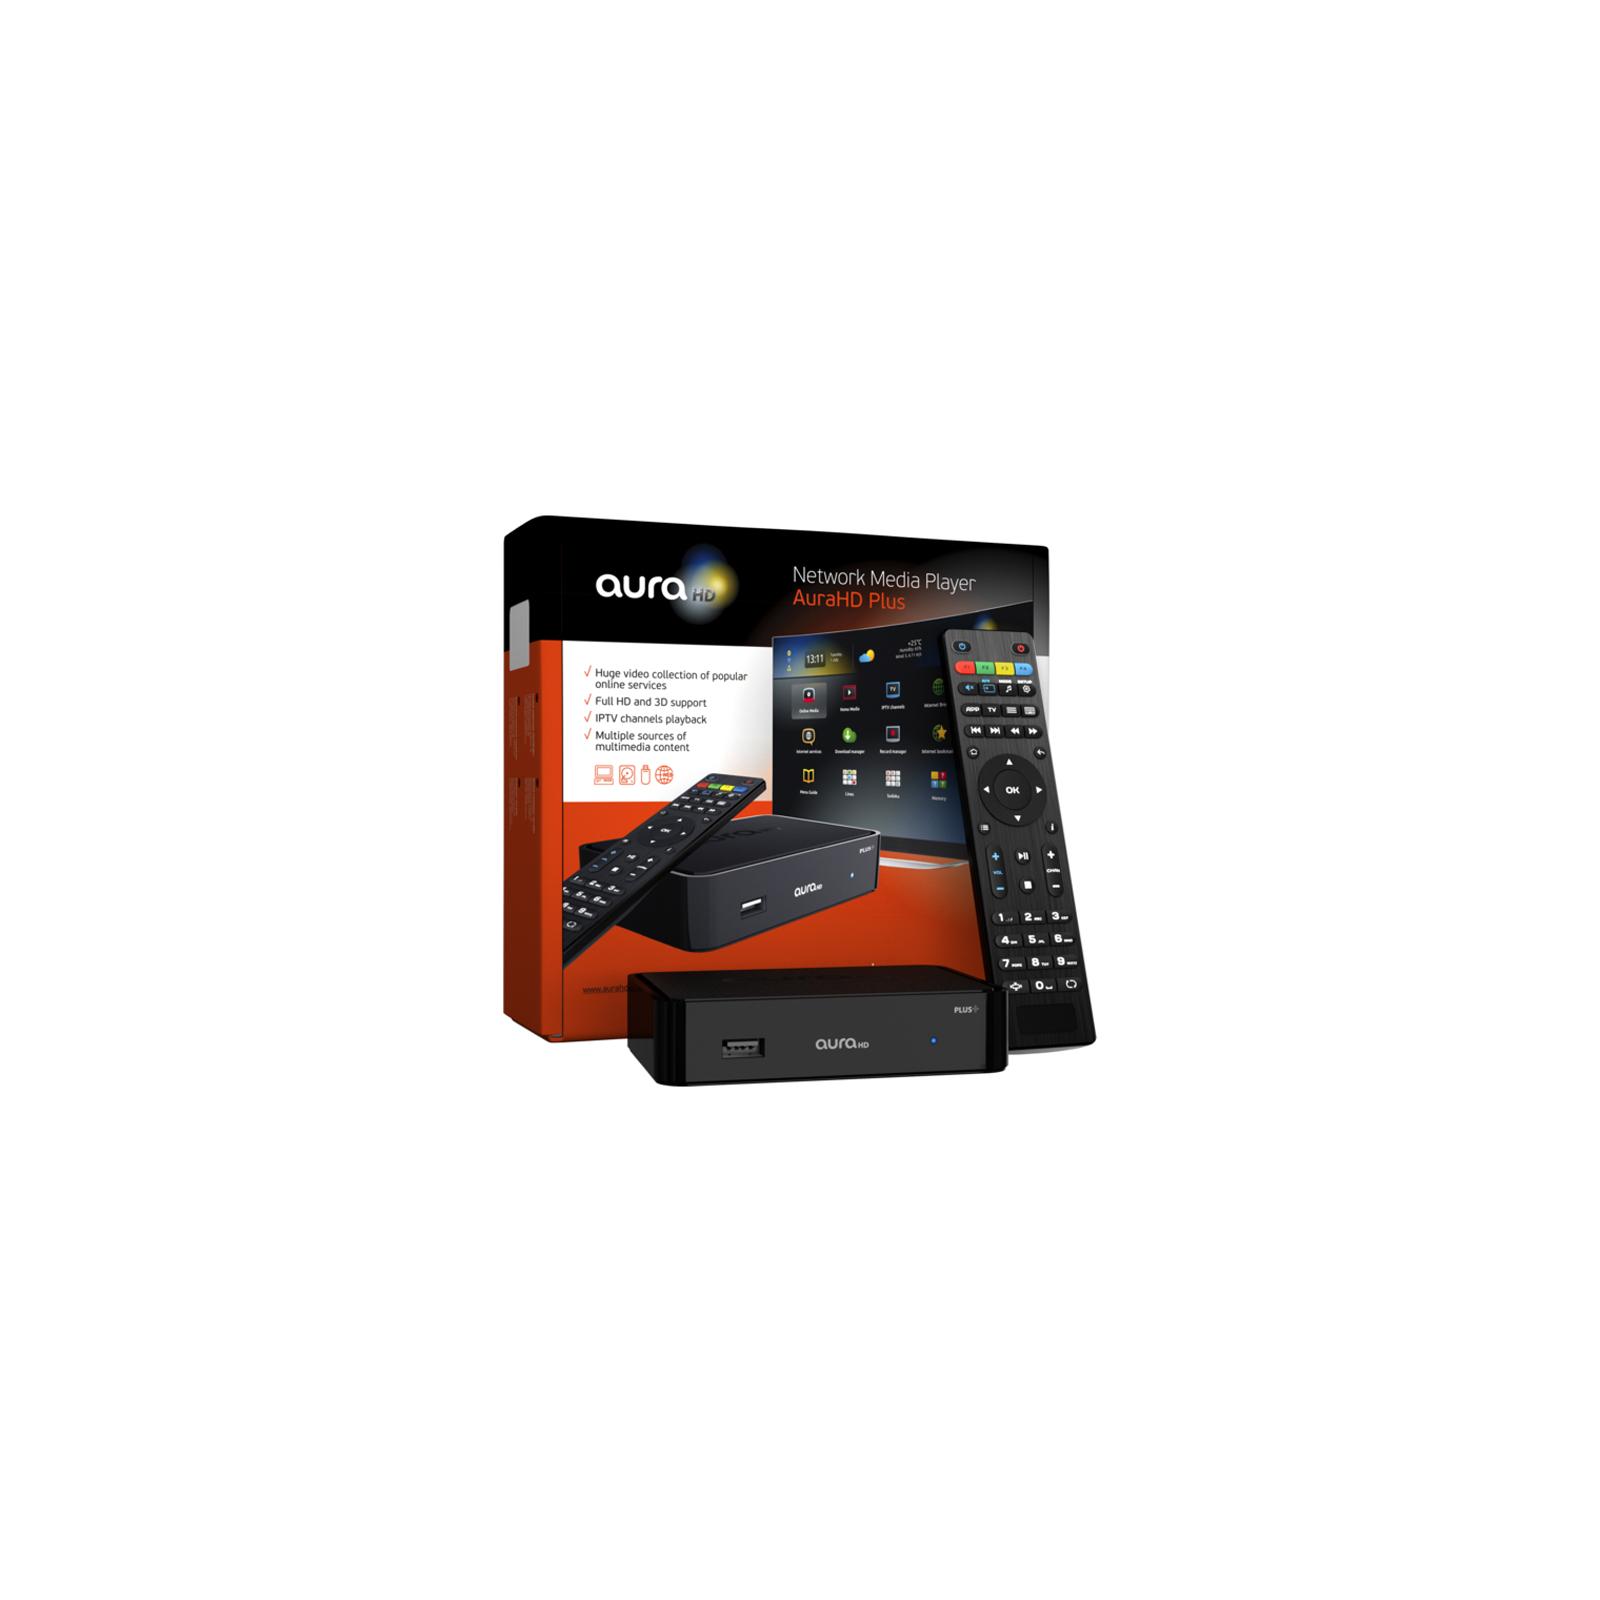 Медиаплеер Aura HD Plus WiFi T2 (Aura HD Plus WiFi T2) изображение 6